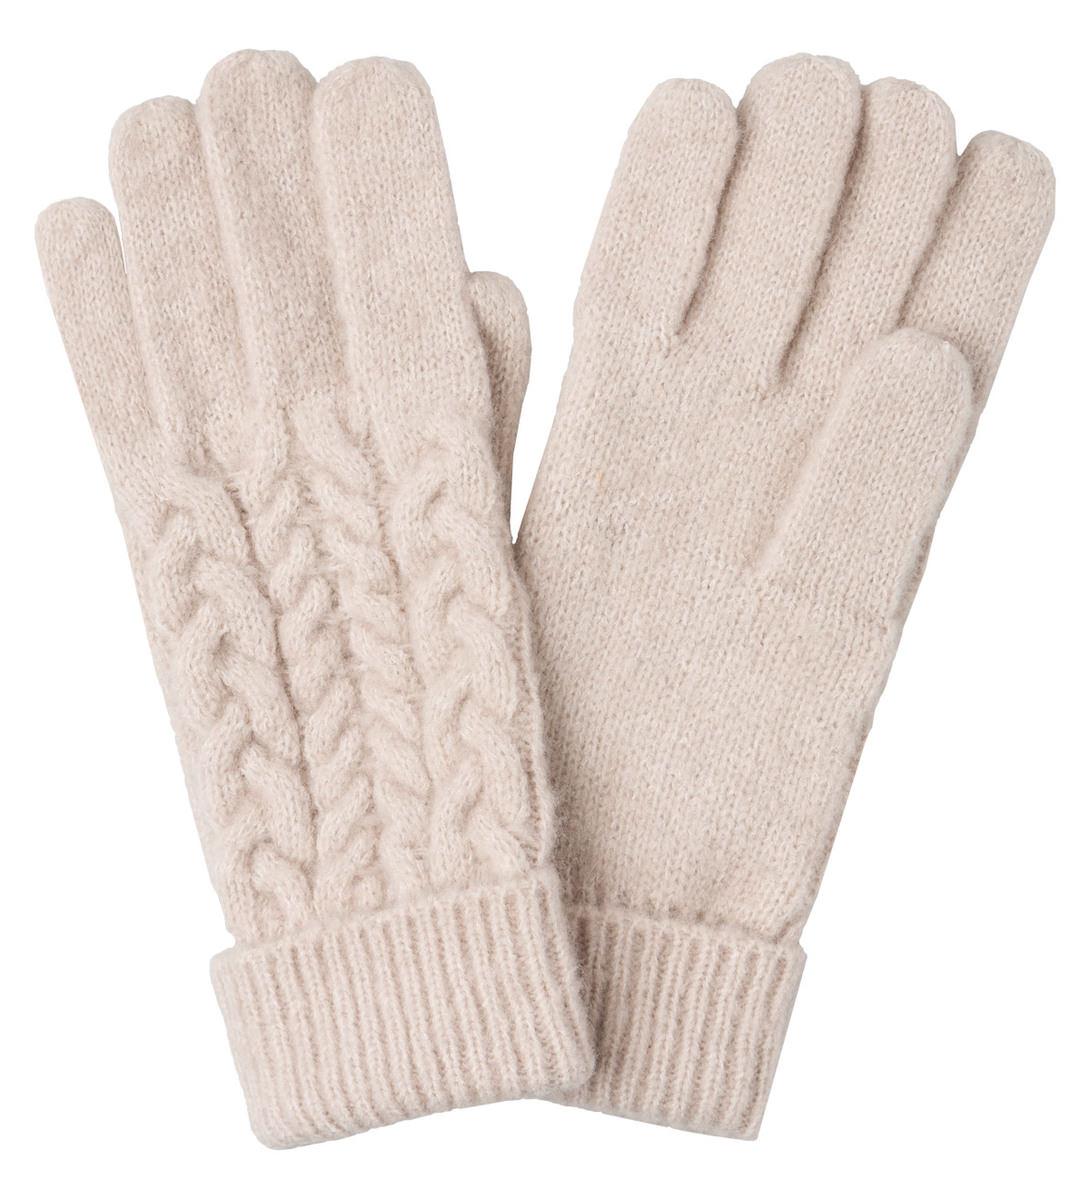 Handschuhe mit Zopfmuster in dove grey